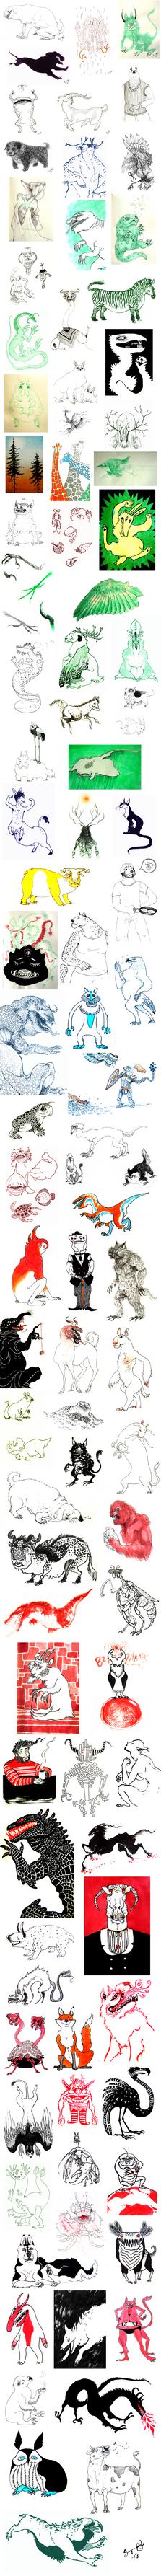 Sketchbook 98